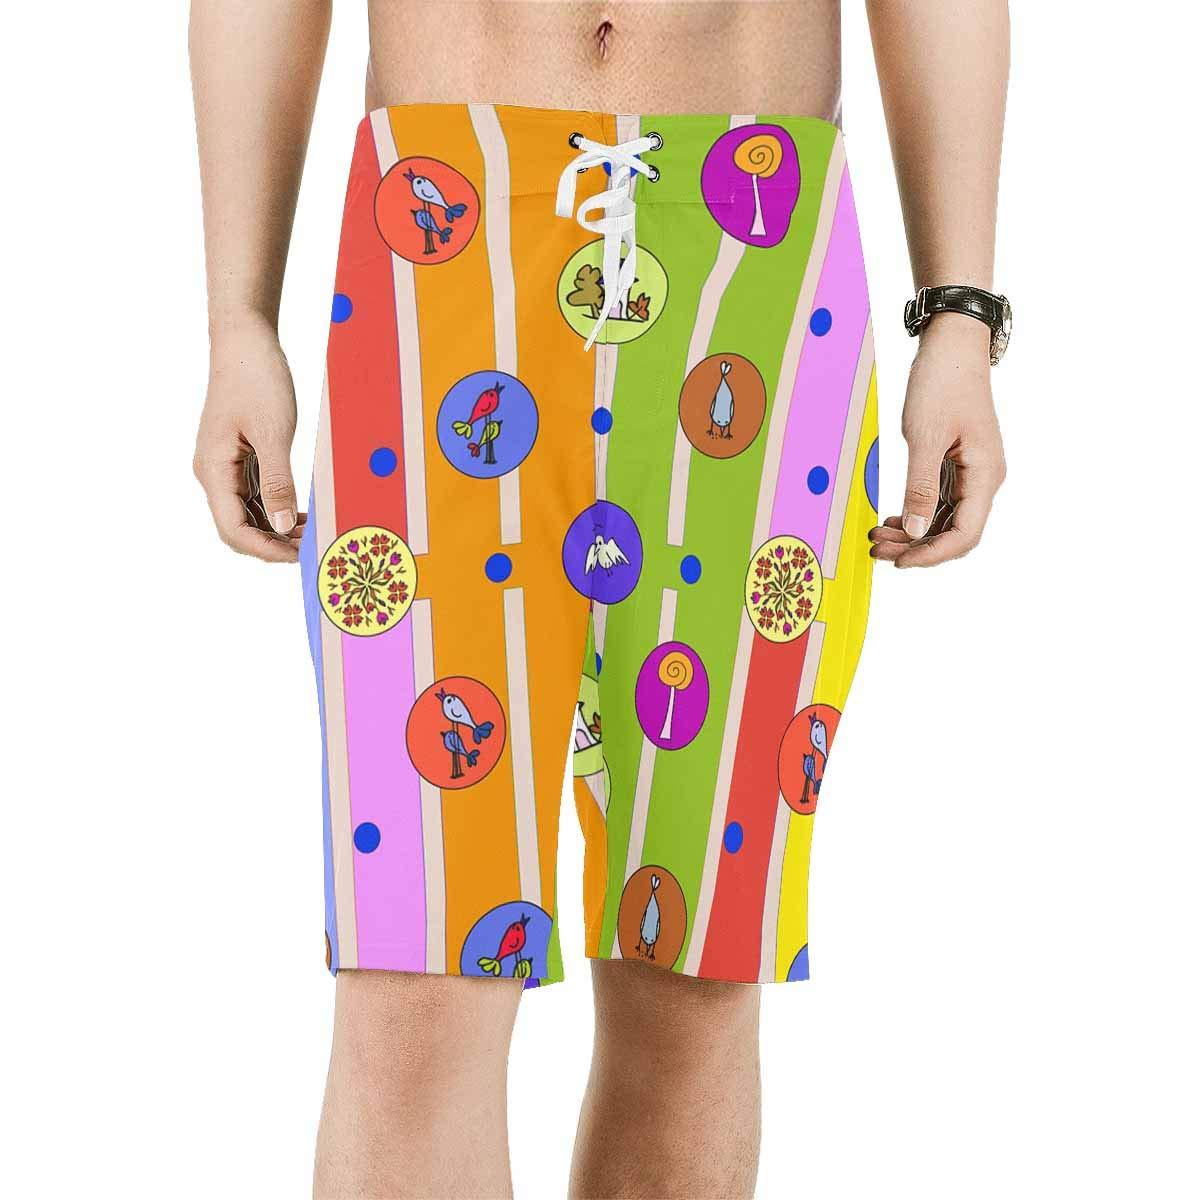 XS-6XL INTERESTPRINT Mens Quick Dry Swim Trunks House Flowers Birds Swimwear Water Board Shorts